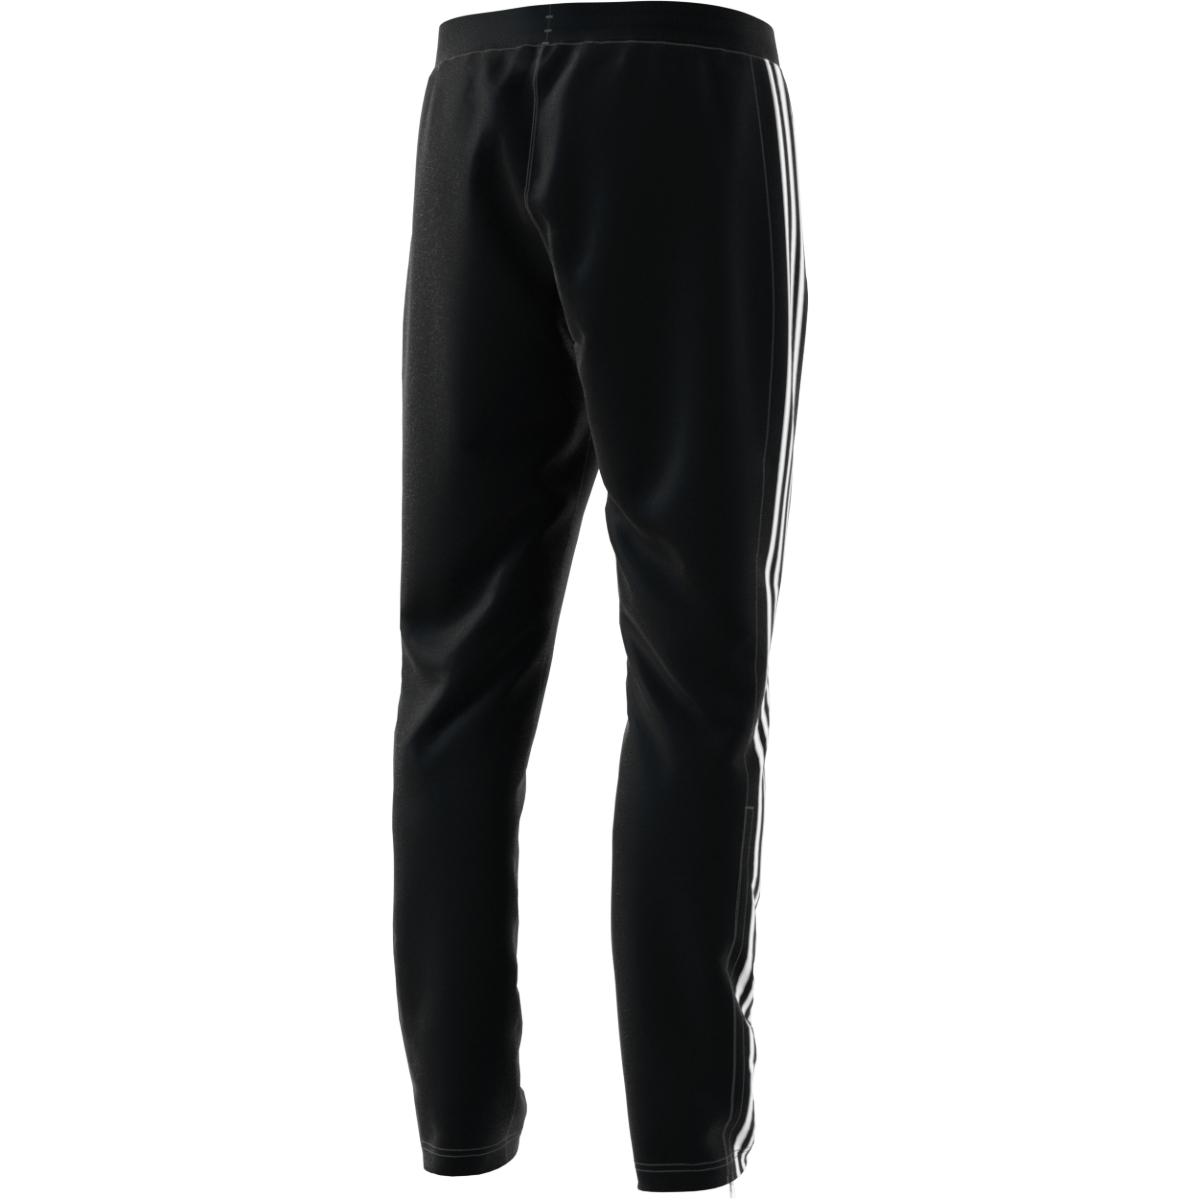 fe093ff51633ff ... Vorschau  adidas T16 Team Sweat Hose Männer schwarz  weiß AJ5395 ...